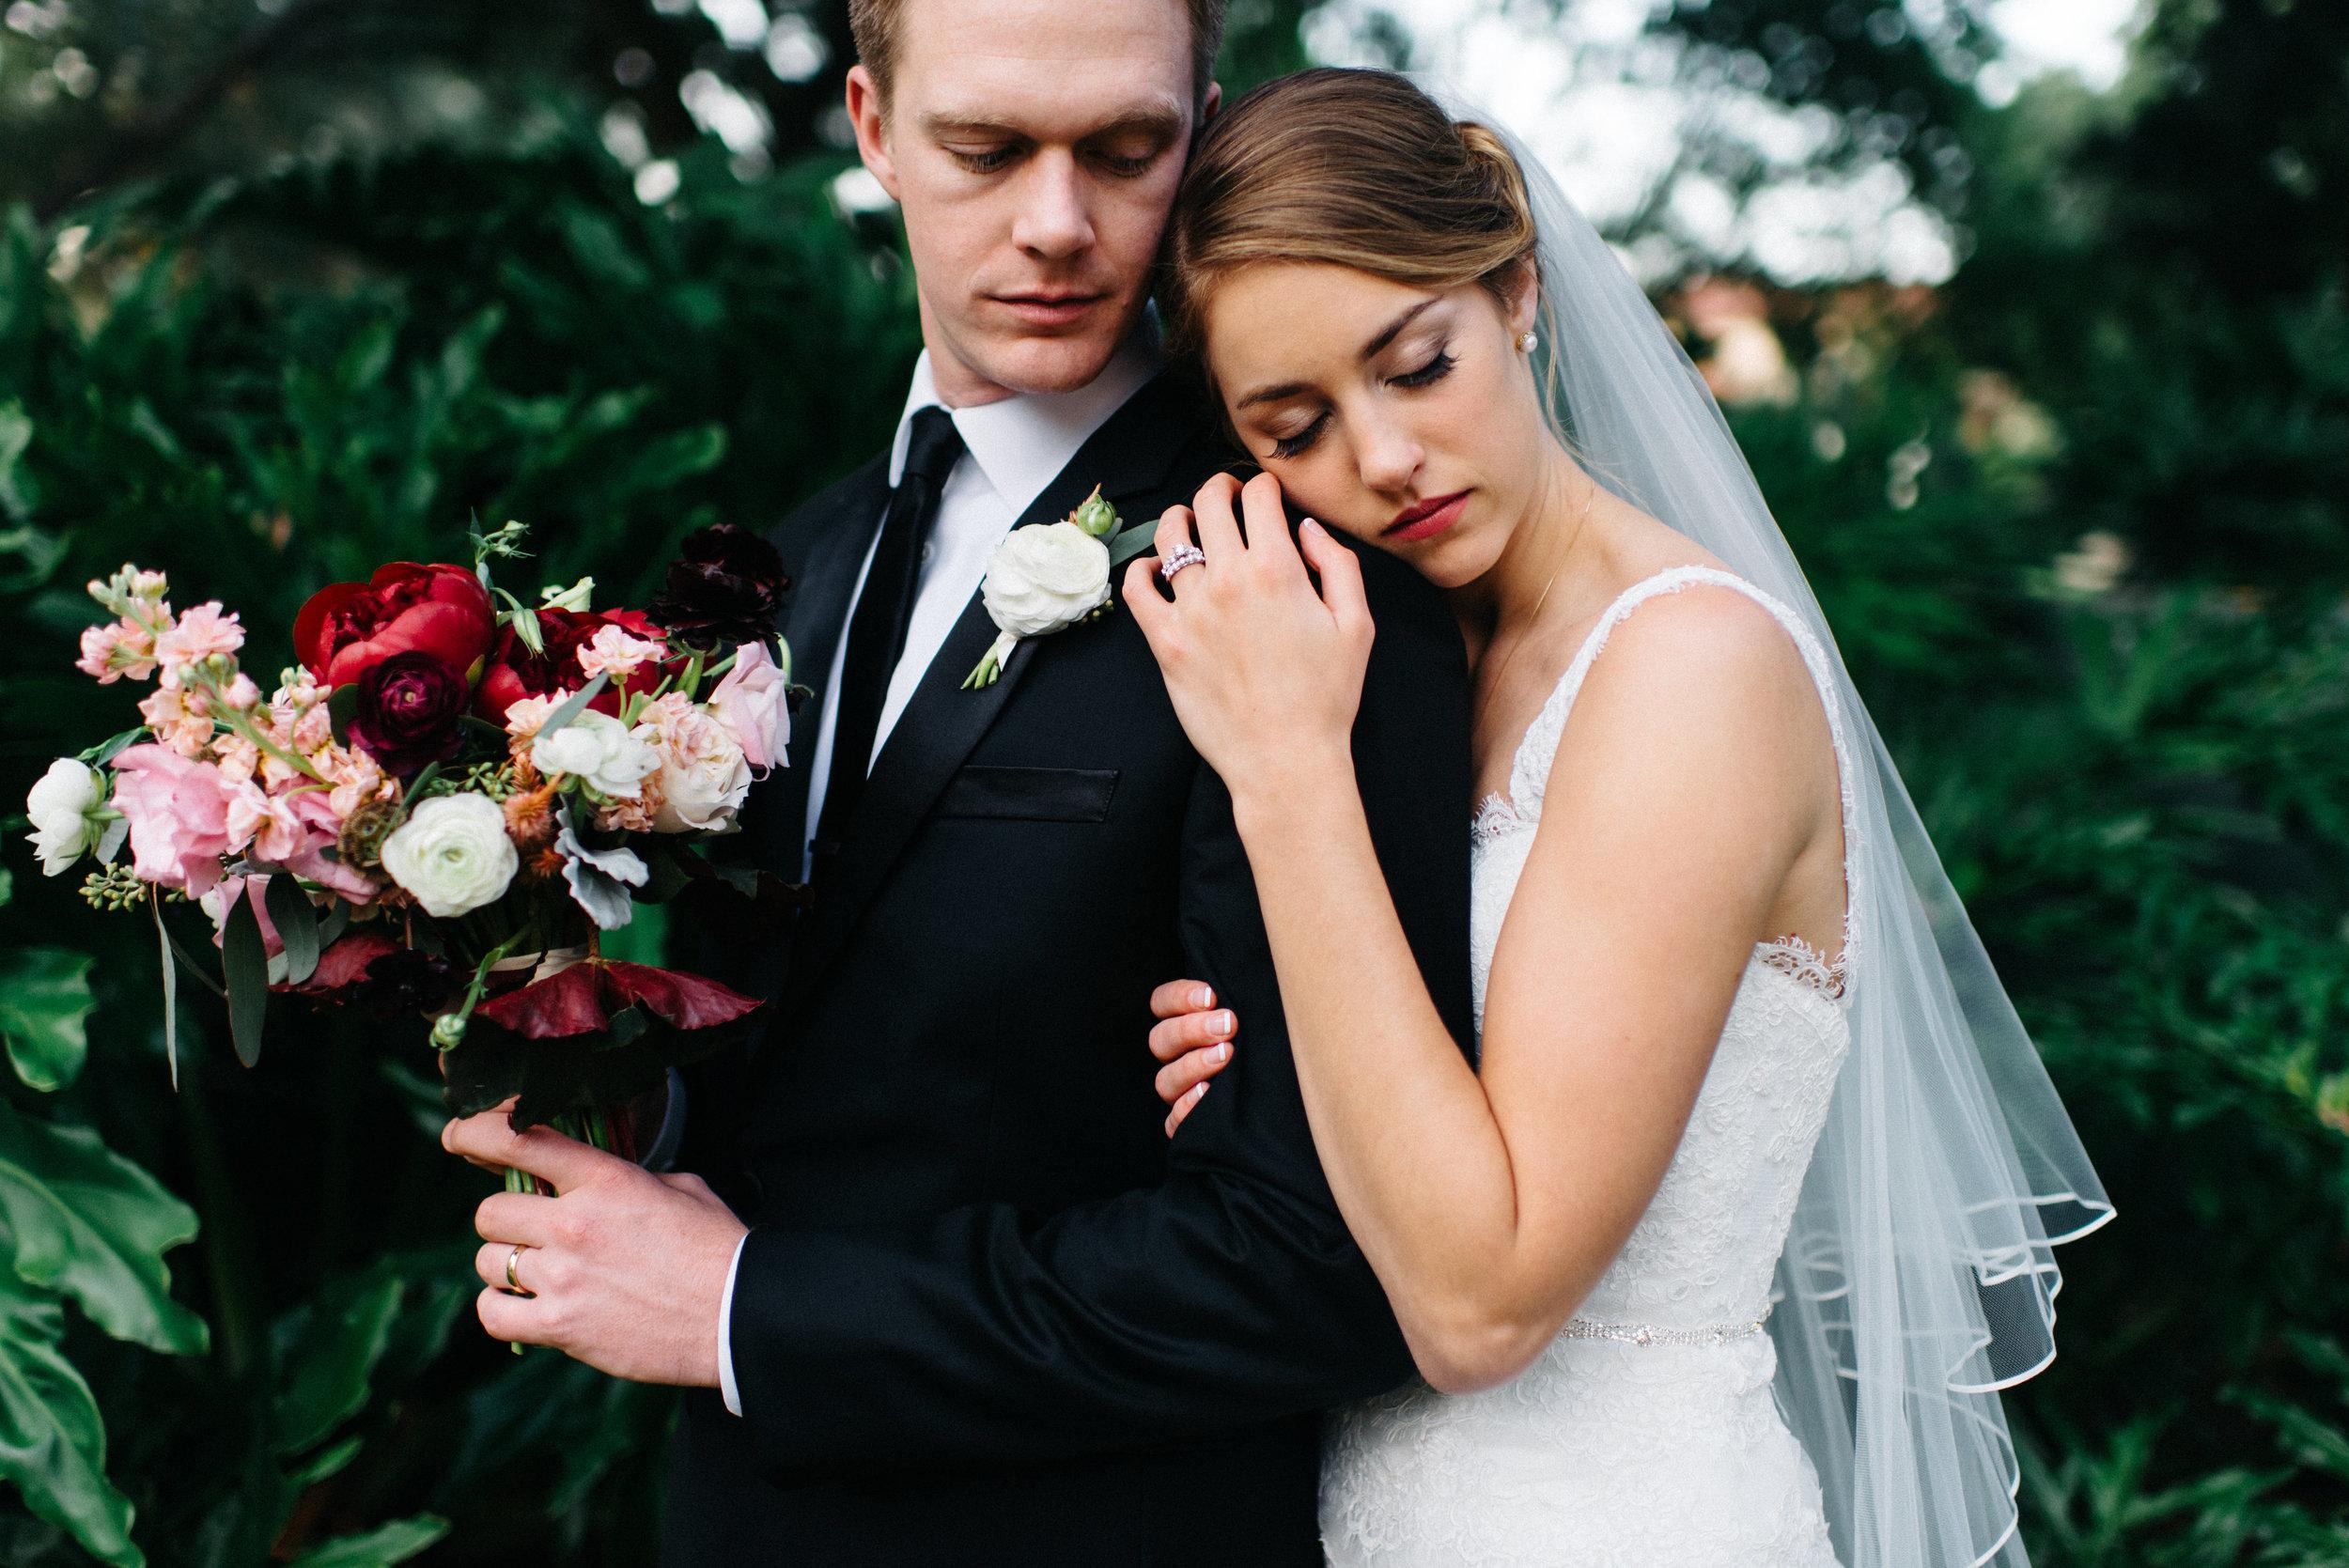 ALLISON MIKE WINTER PARK FL WEDDING-000 SMUGMUG-0204.jpg